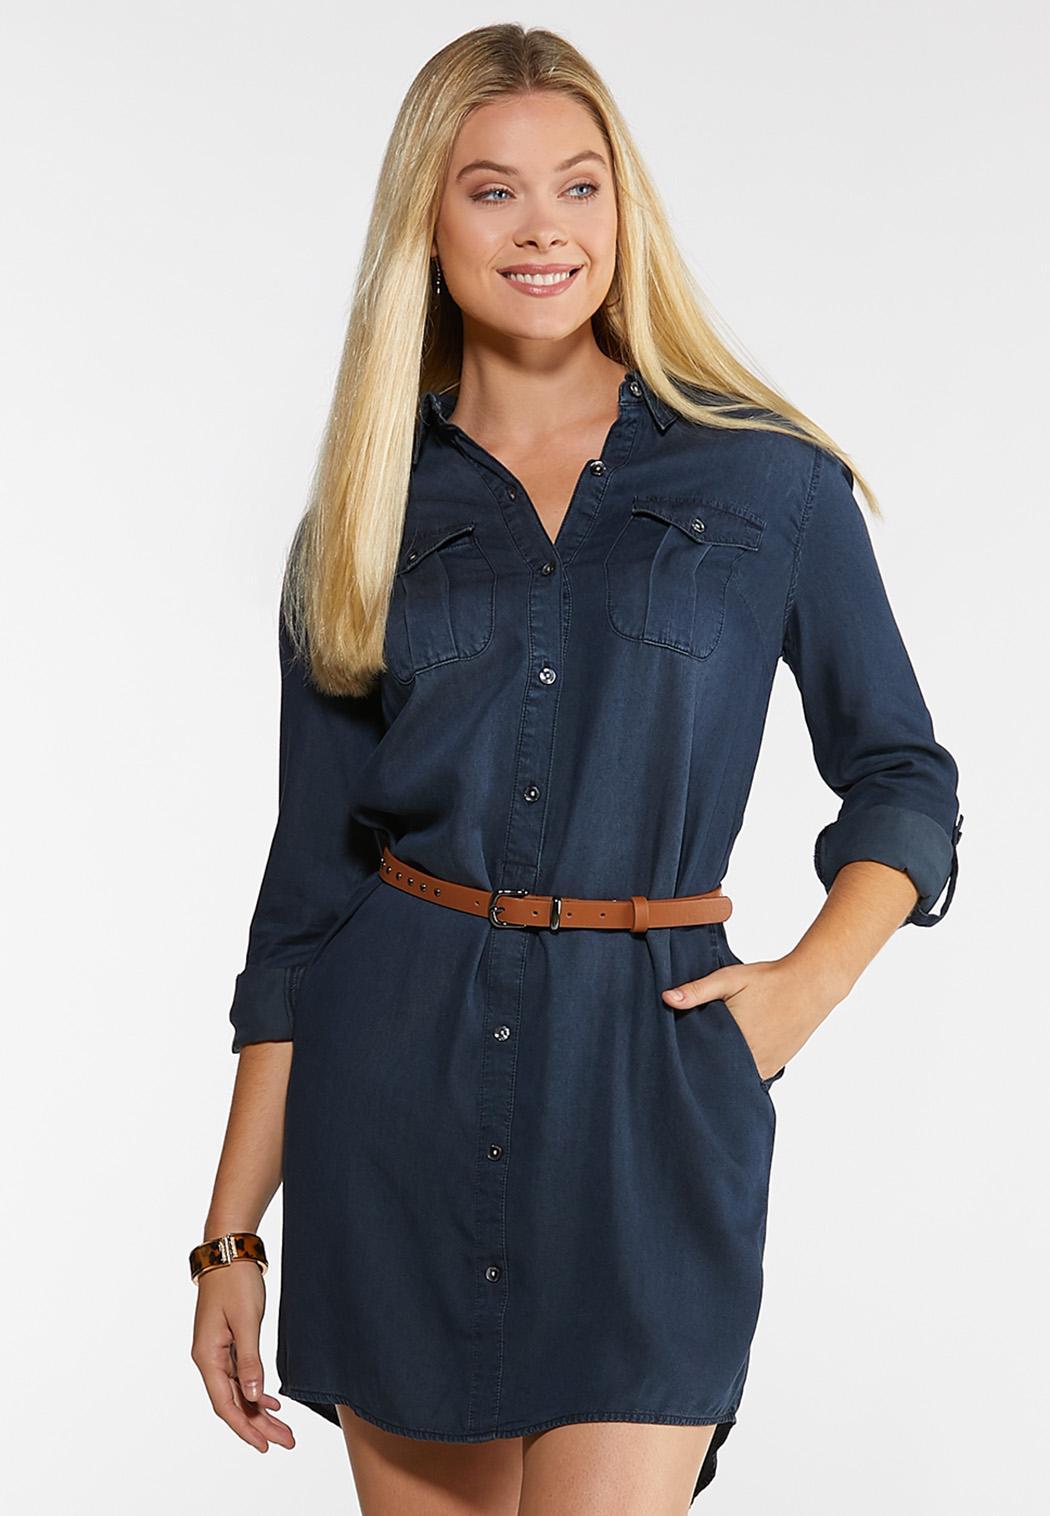 Plus Size Denim Shirt Dress Dresses Cato Fashions